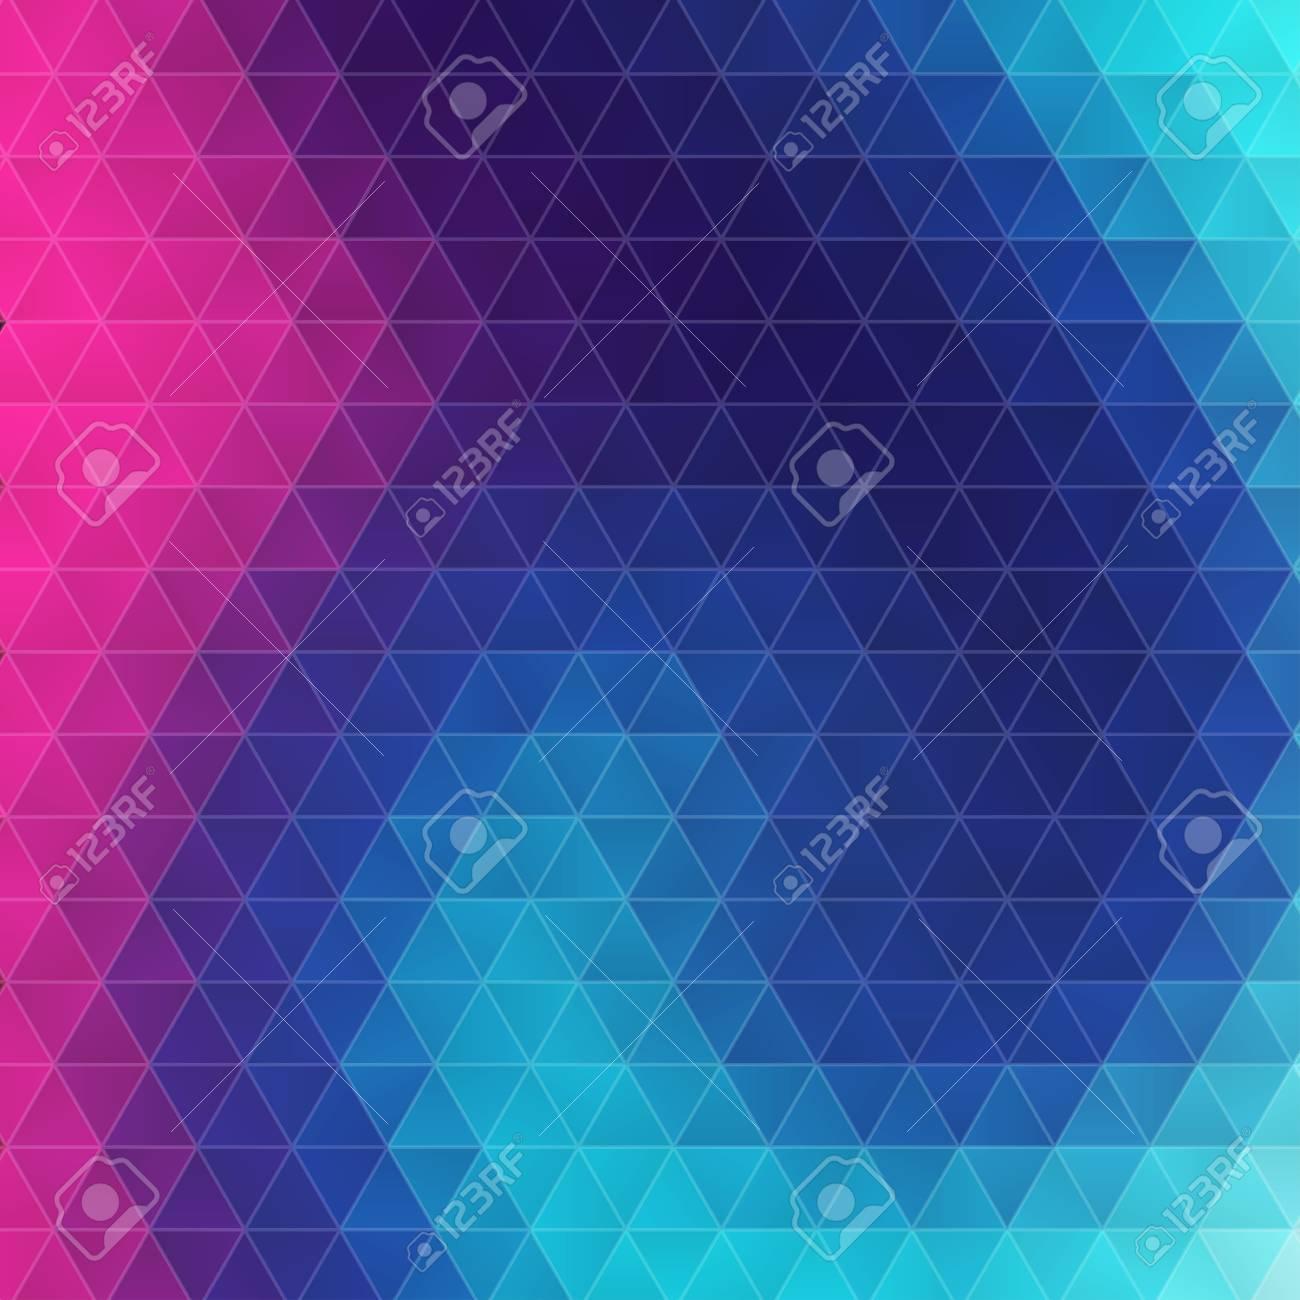 Resumen De Moda Triángulo Geométrico Colorido Hipsters Fondo. Ideal ...